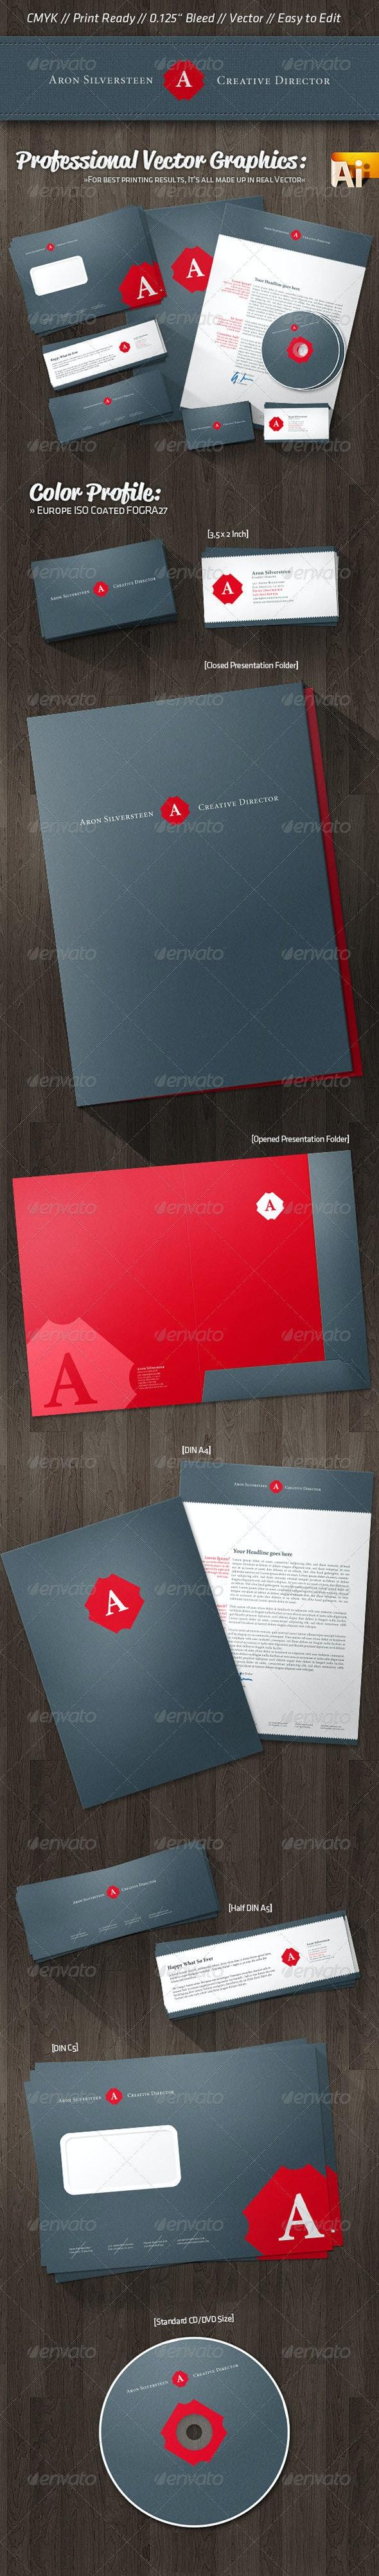 Creative Director Corporate Identity Retro Style - Stationery Print Templates